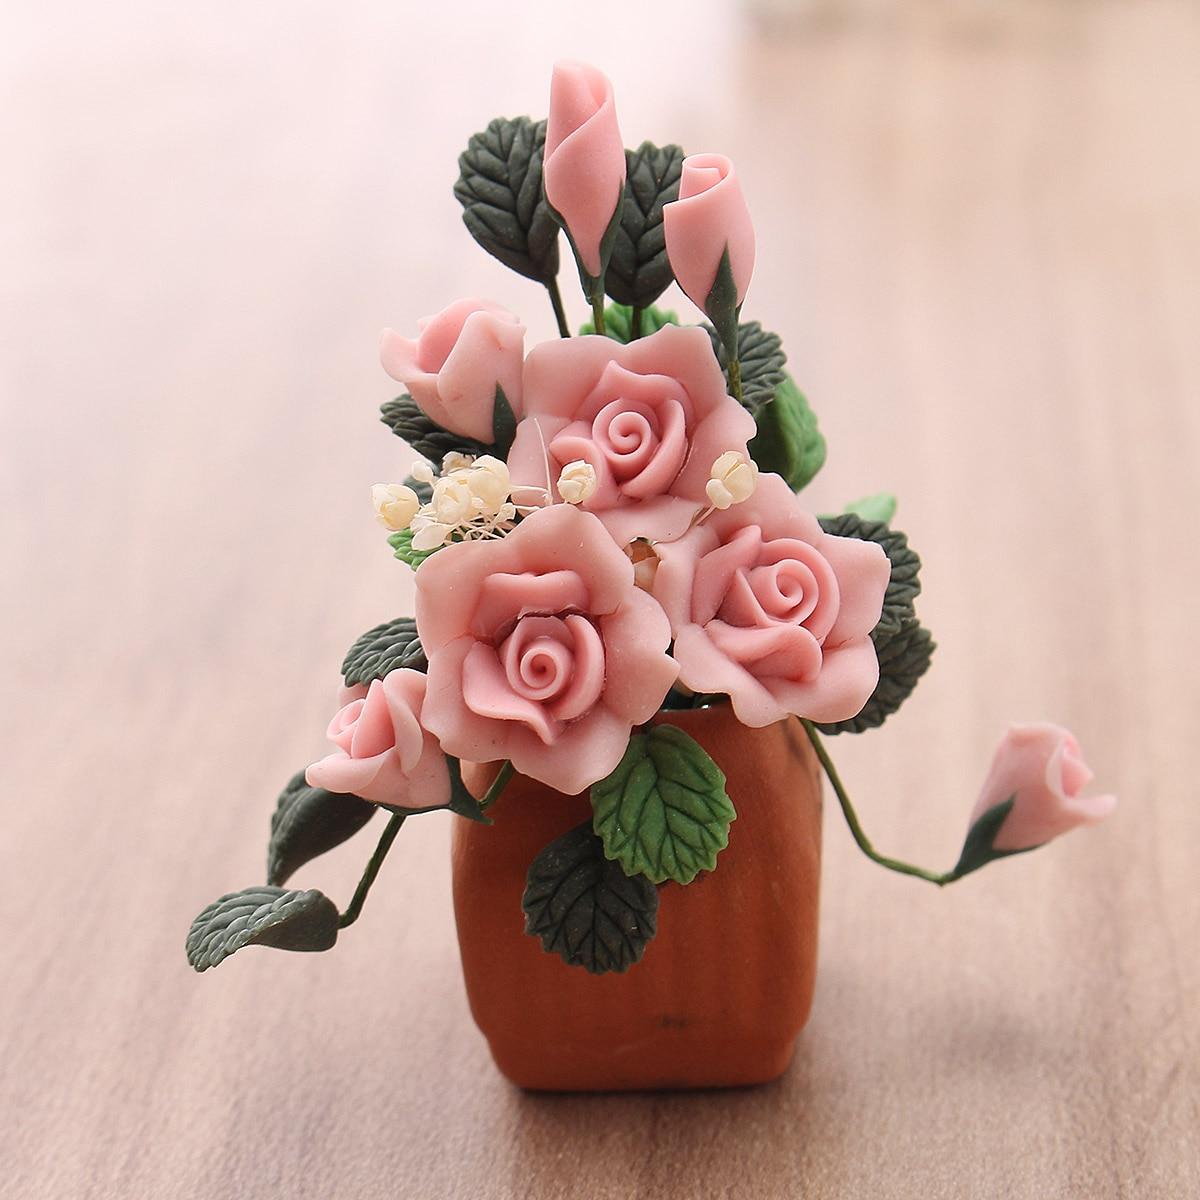 AliExpress & US $3.17 22% OFF|New Mini Pretty 1:12 Dollhouse Miniature Clay Flower Pot Model Handcrafted Home Room Garden Decor Ornament-in Figurines \u0026 Miniatures ...